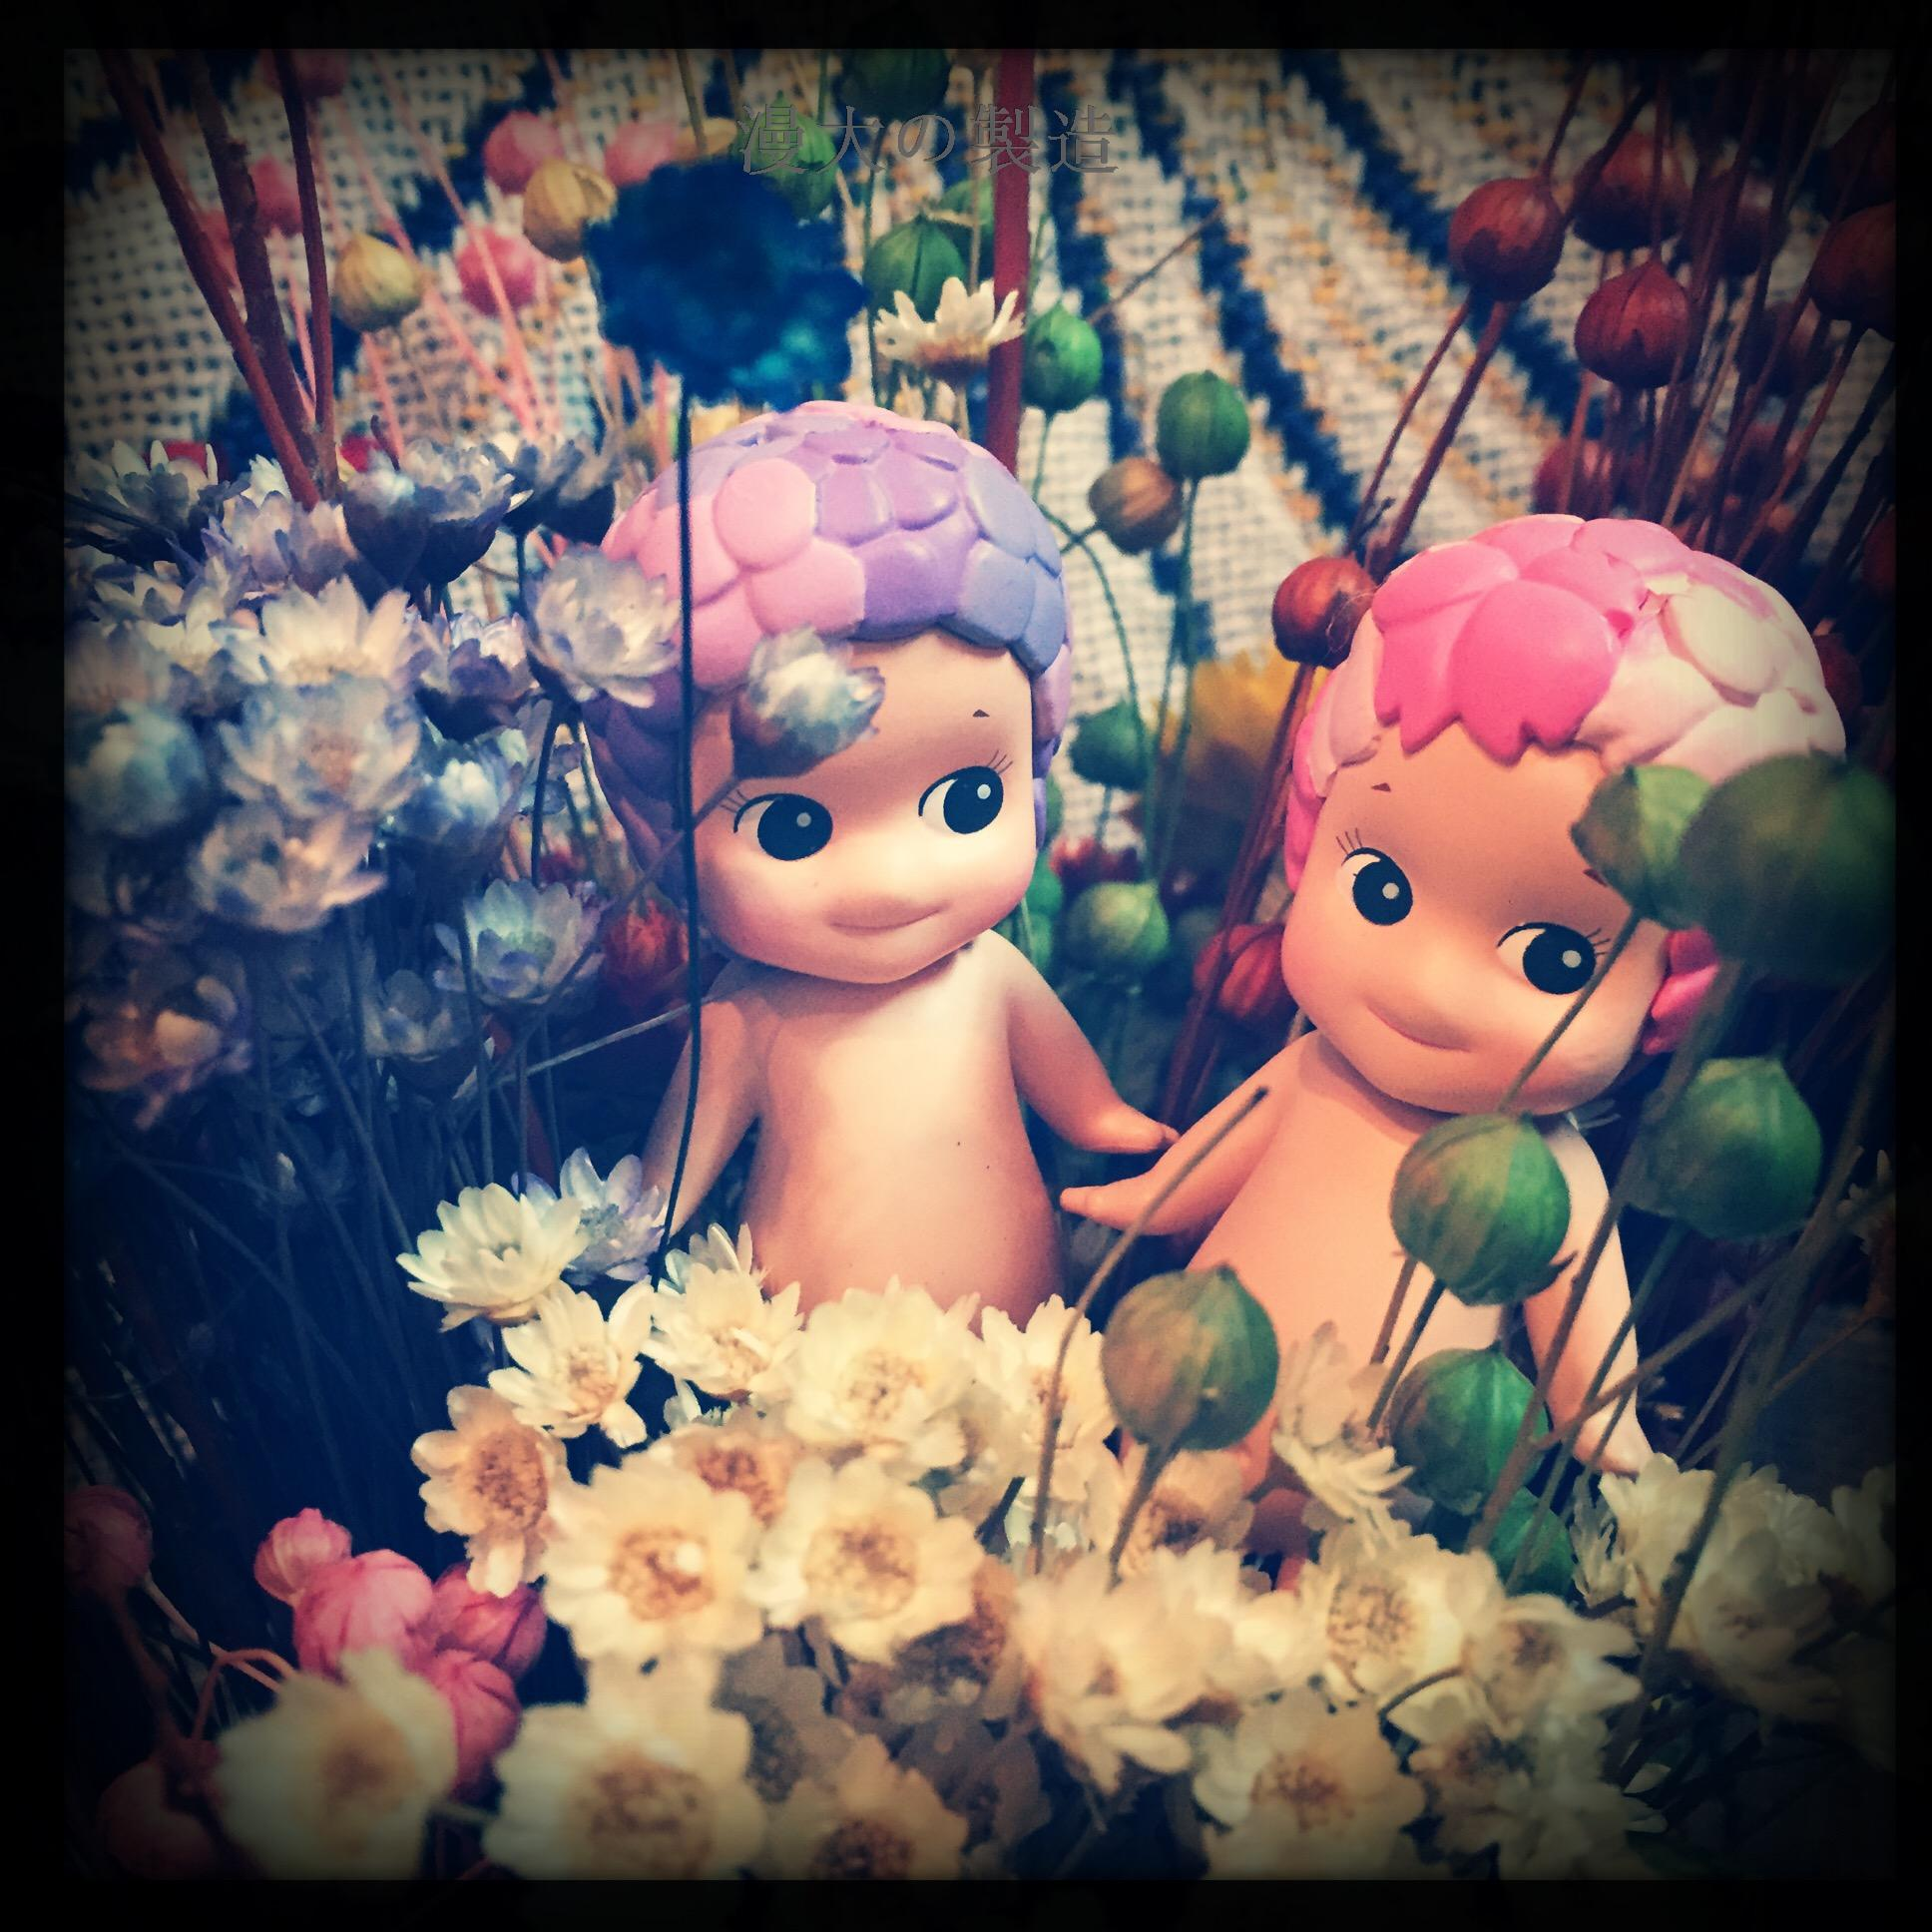 Куклы/ украшения/детали Sonny angel sonny angel mini figures easter series 6pcs set toys christmas